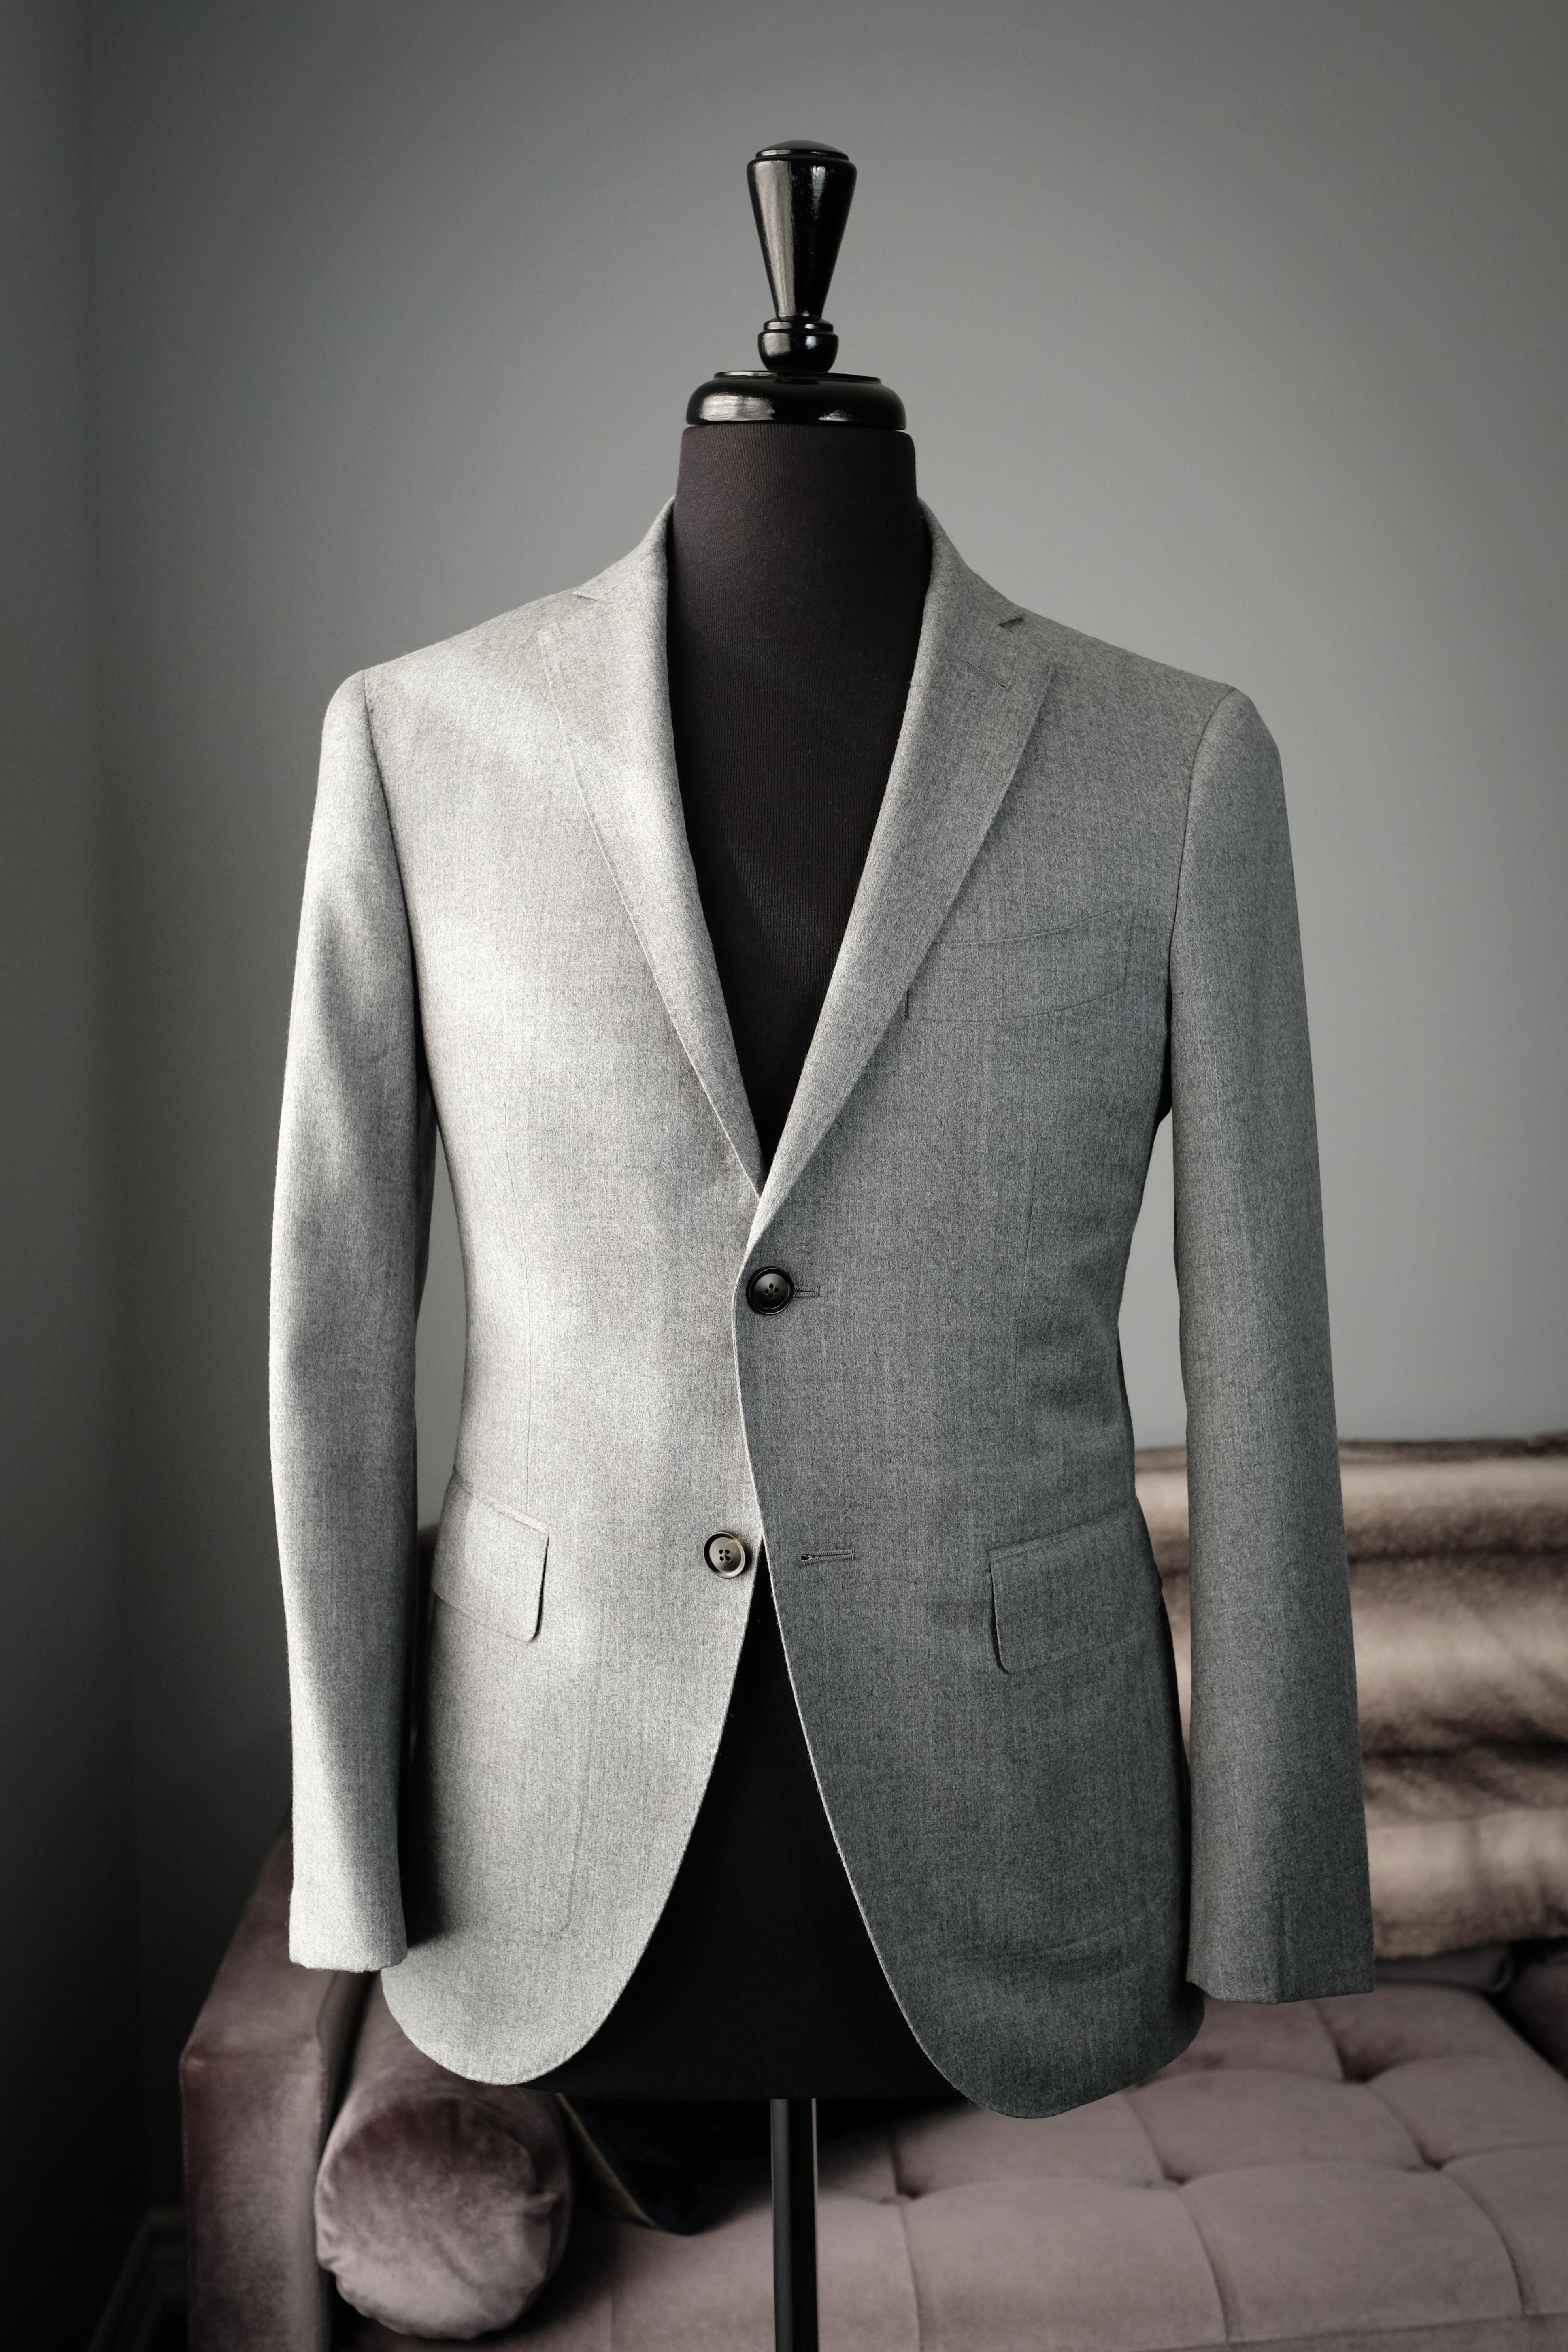 Men's grey suit jacket